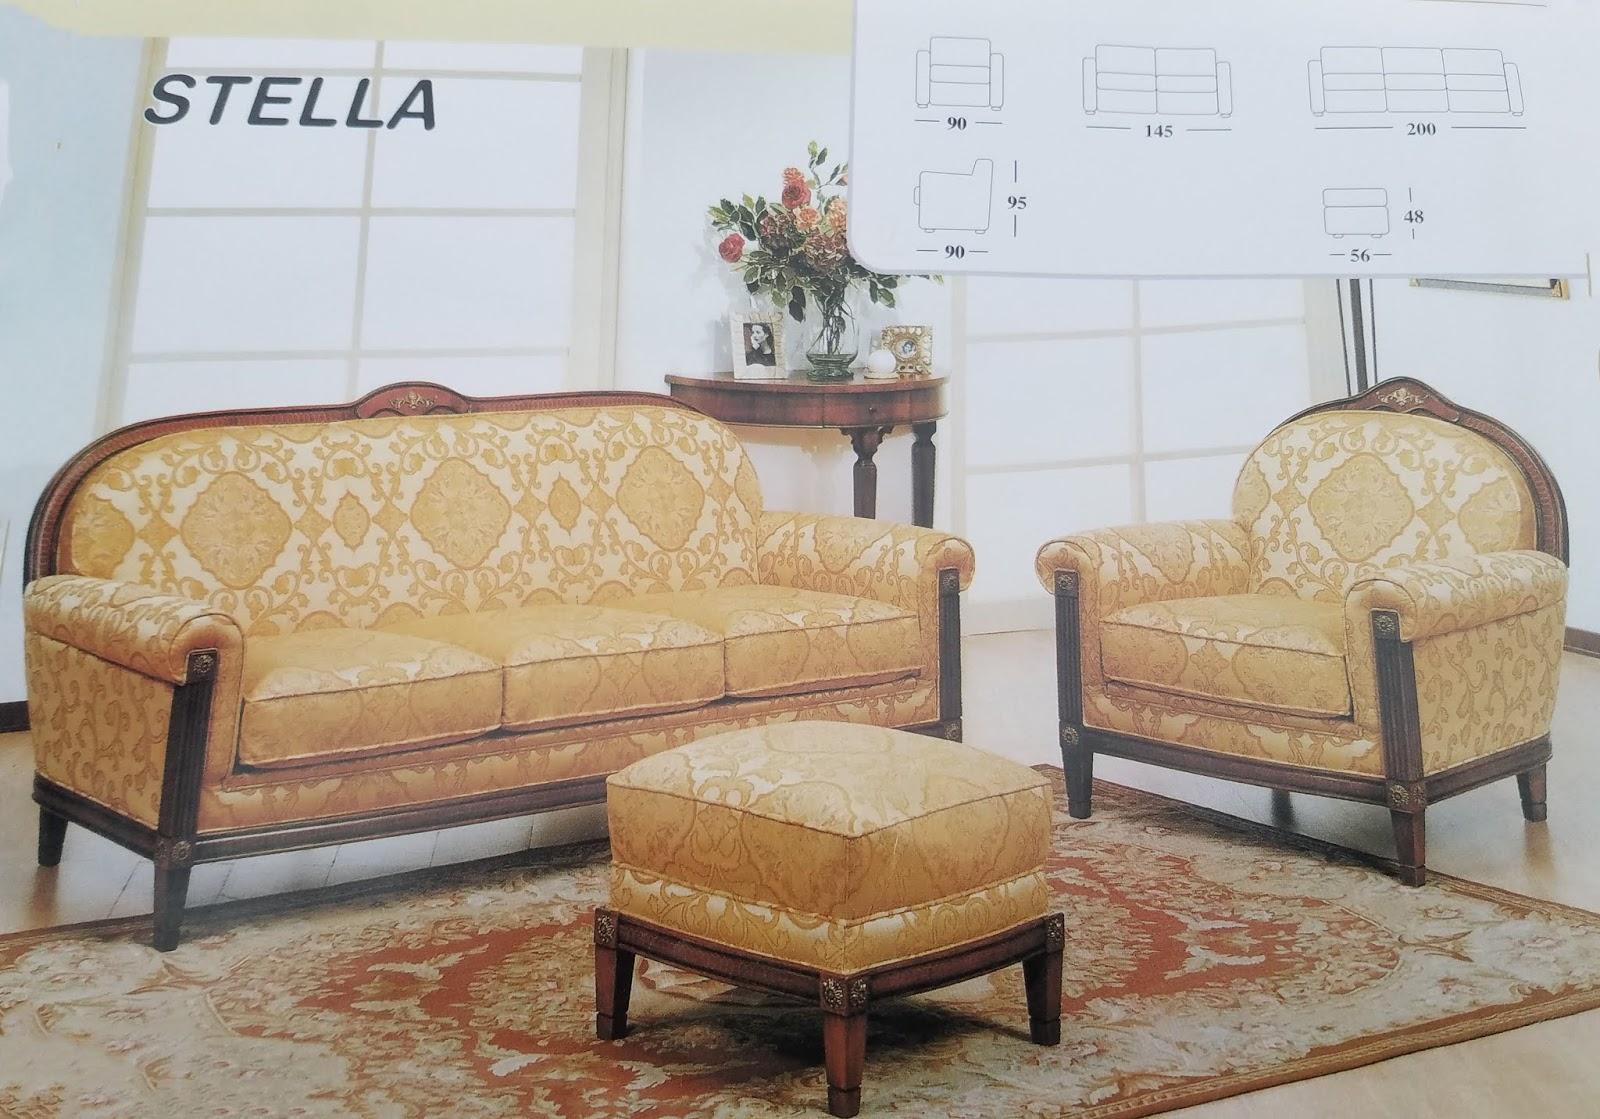 Pleasing Wooden Sofa Set With Price List In Pakistan 2019 Peshawar Download Free Architecture Designs Itiscsunscenecom